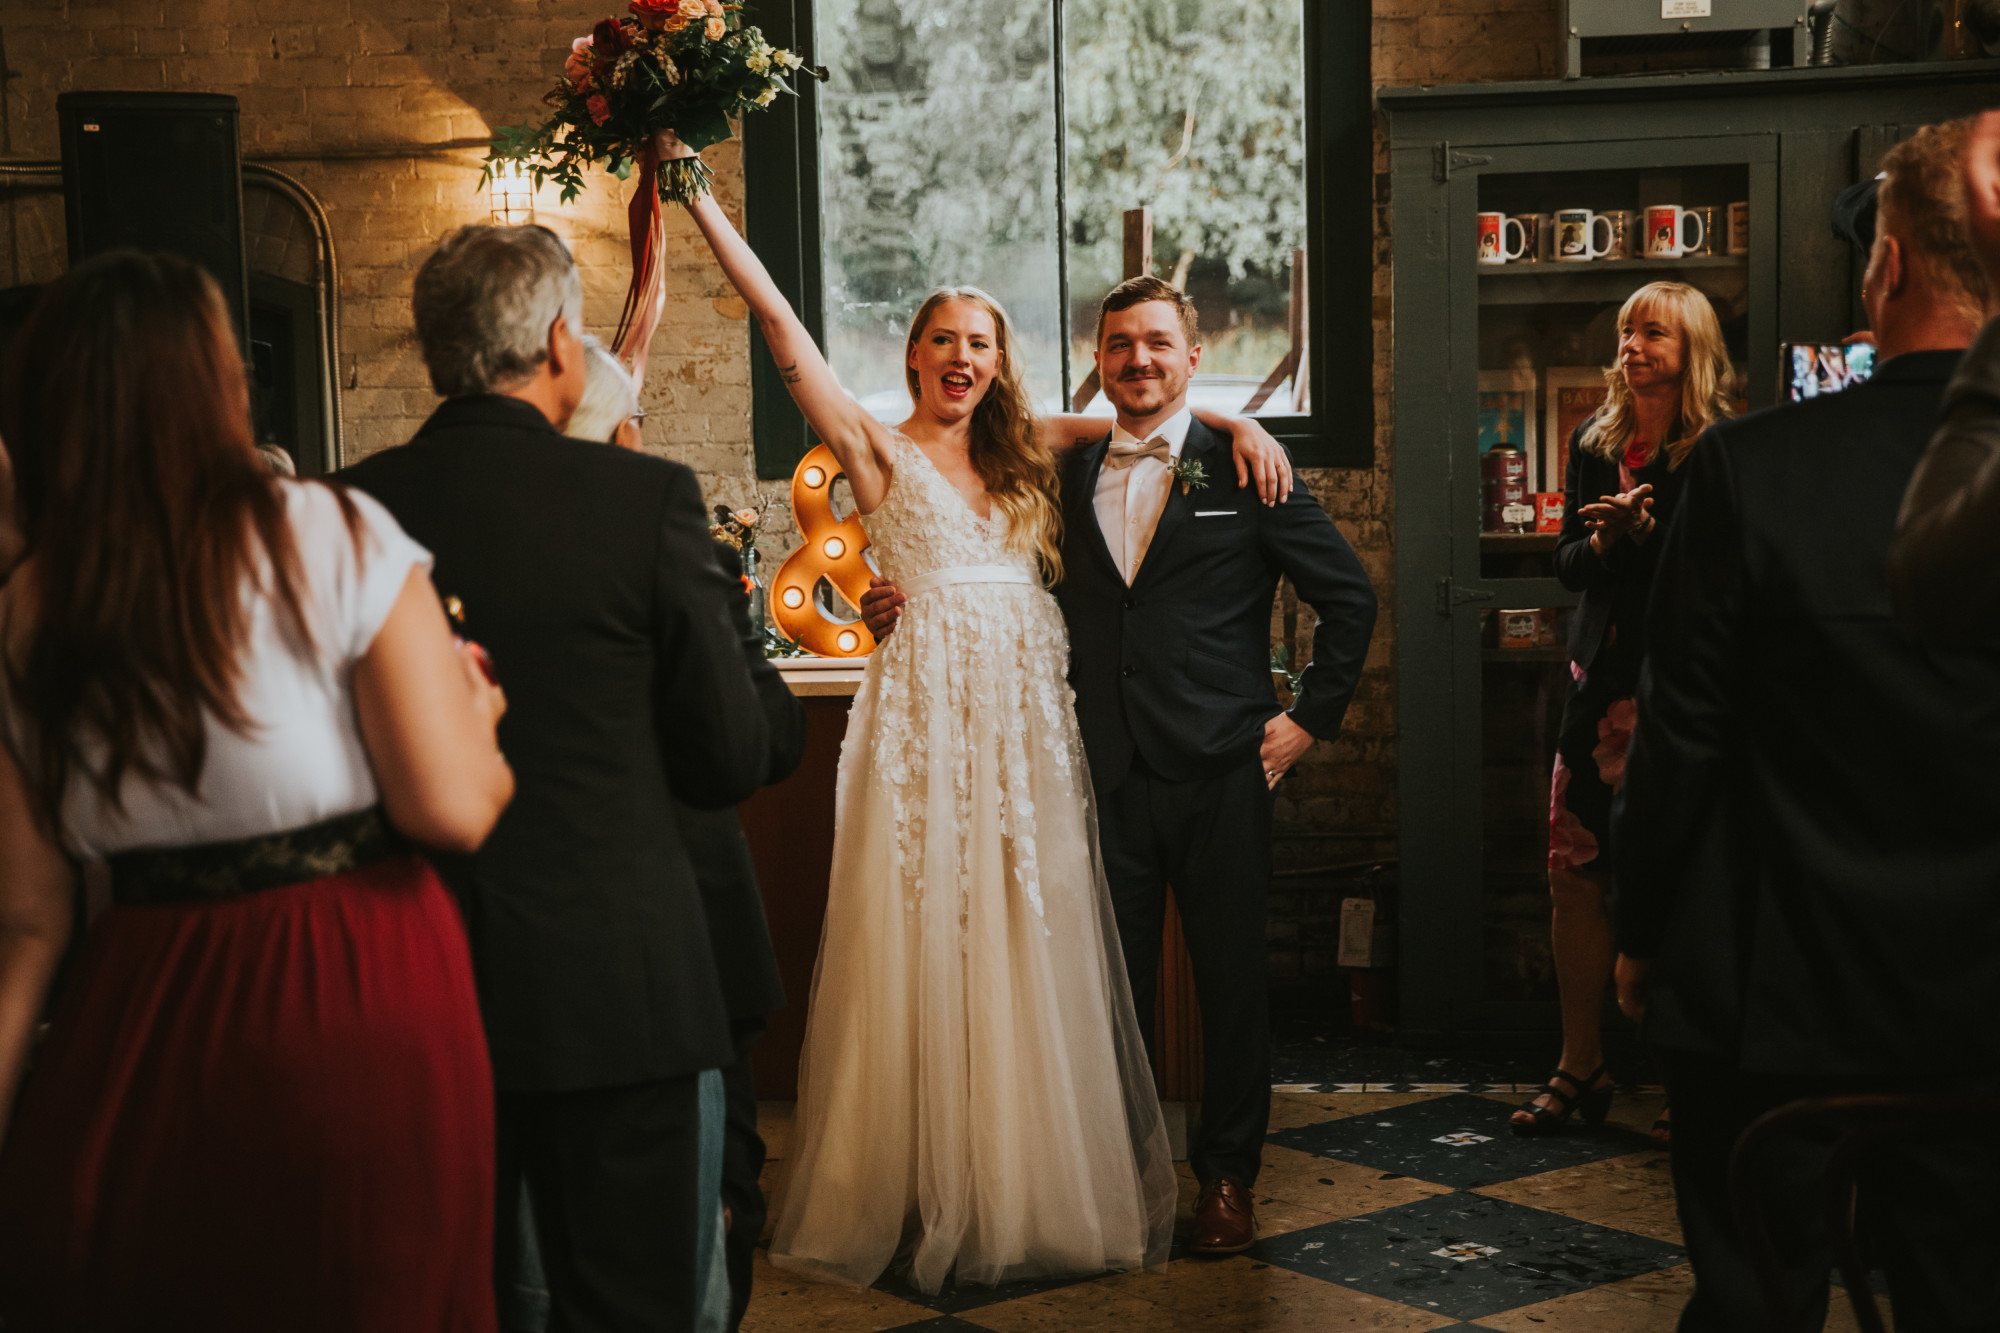 Beth-Ted-Balzacs-Coffee-Distillery-District-Toronto-Wedding-Planning-INLY-Events-Lushana-Bale-Photography-0201.jpg